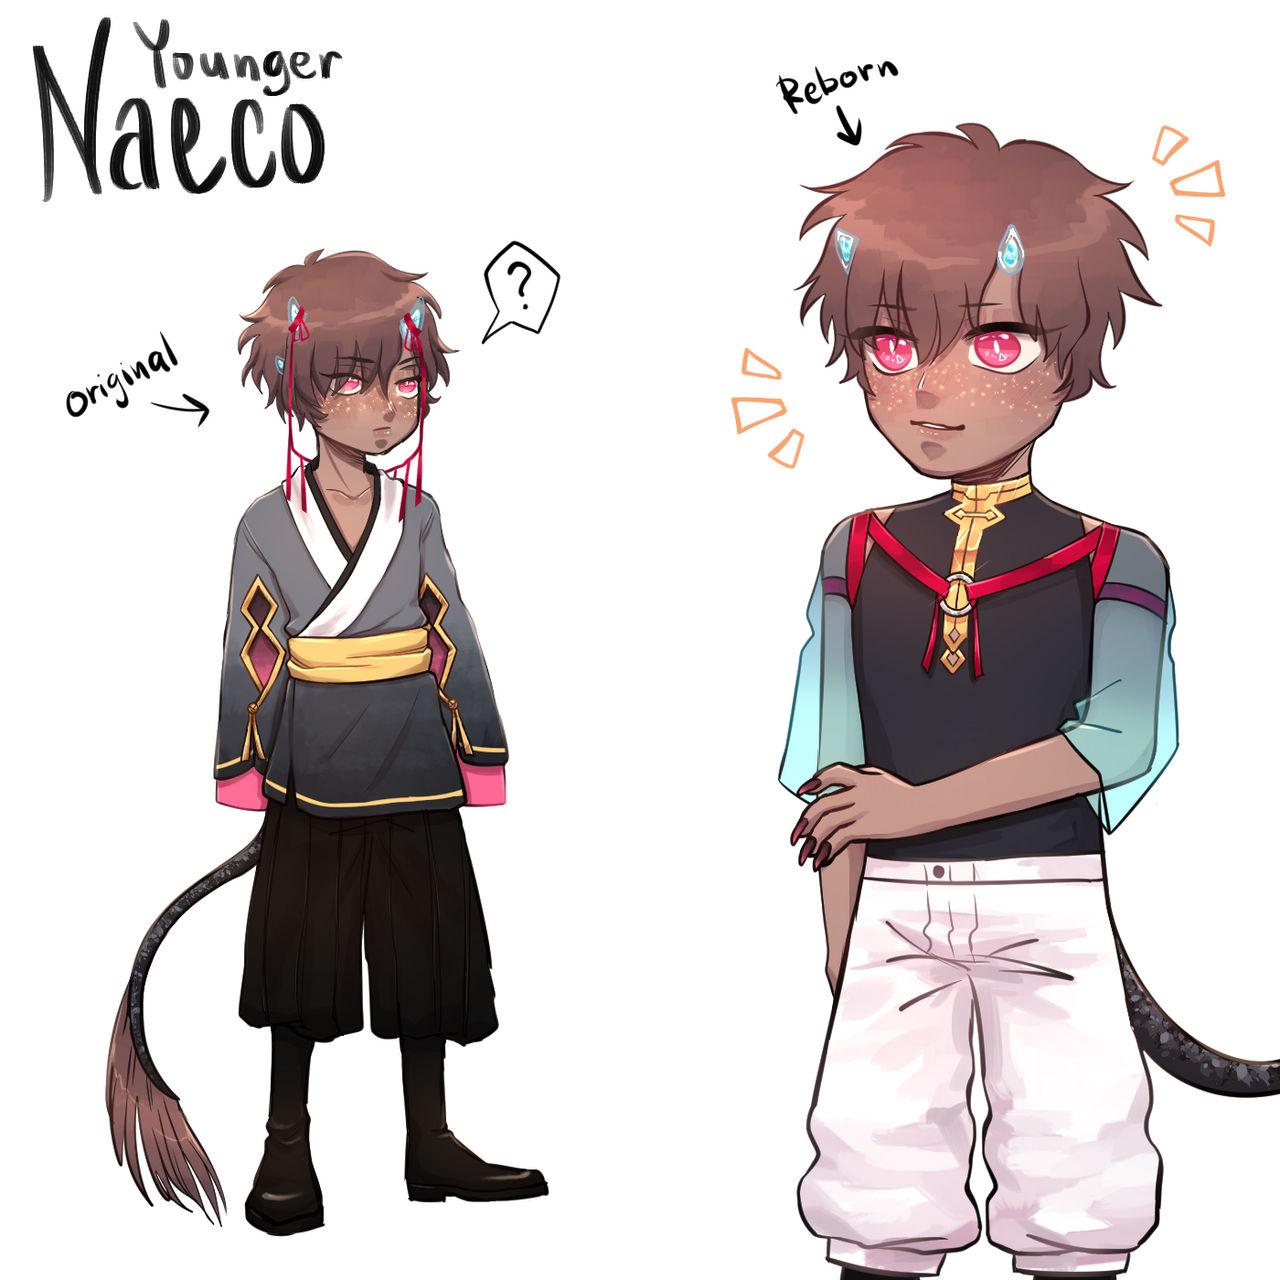 Young Naeco